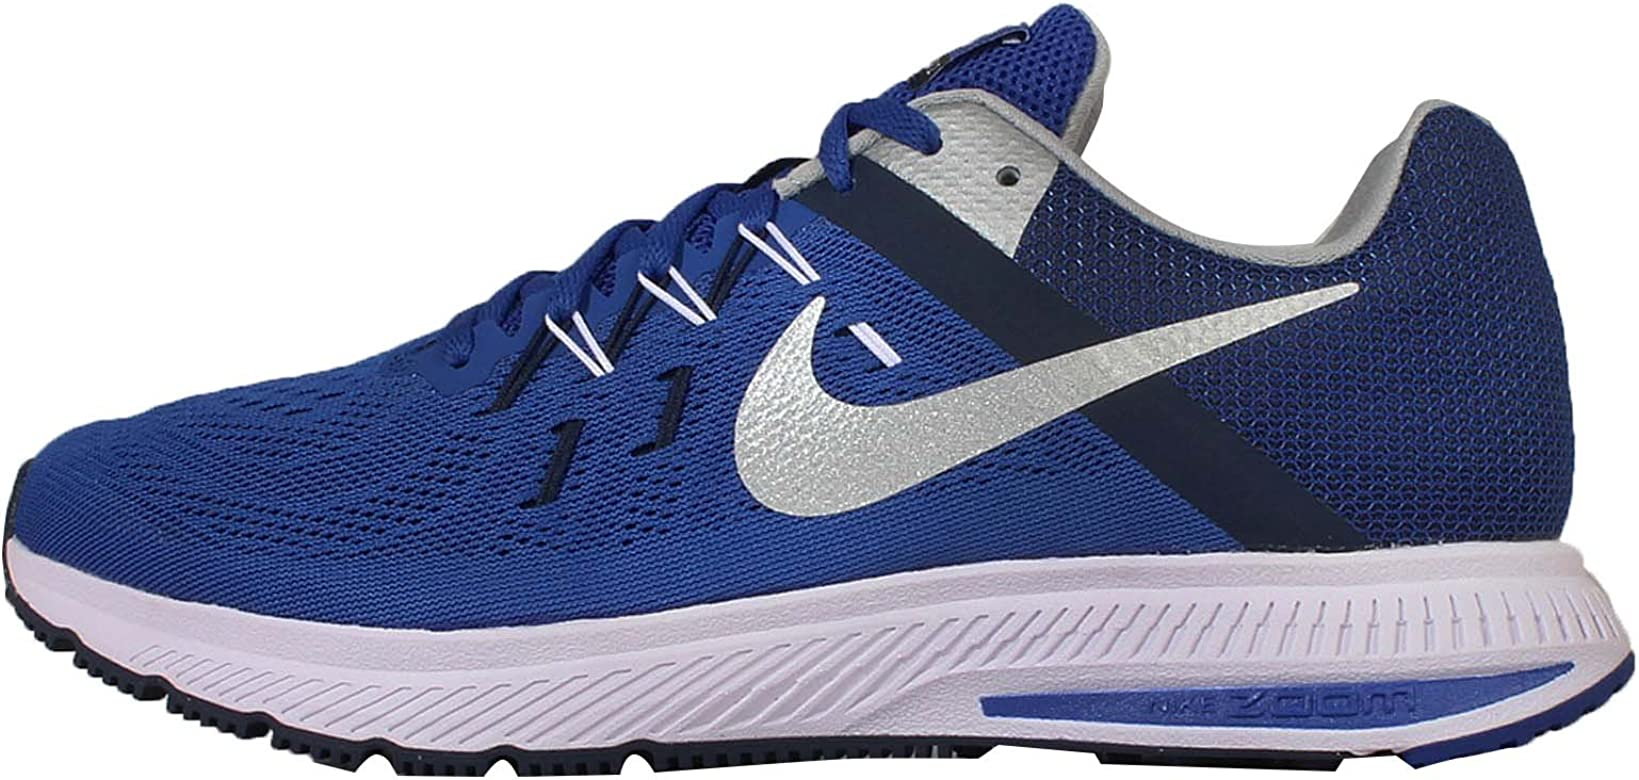 Nike Zoom Winflo 2, Zapatillas de Running para Hombre, Azul/Plata/Azul Marino/Blanco (Rcr Bl/Mtllc Slvr-Mid Nvy-Whit), 40 EU: Amazon.es: Zapatos y complementos